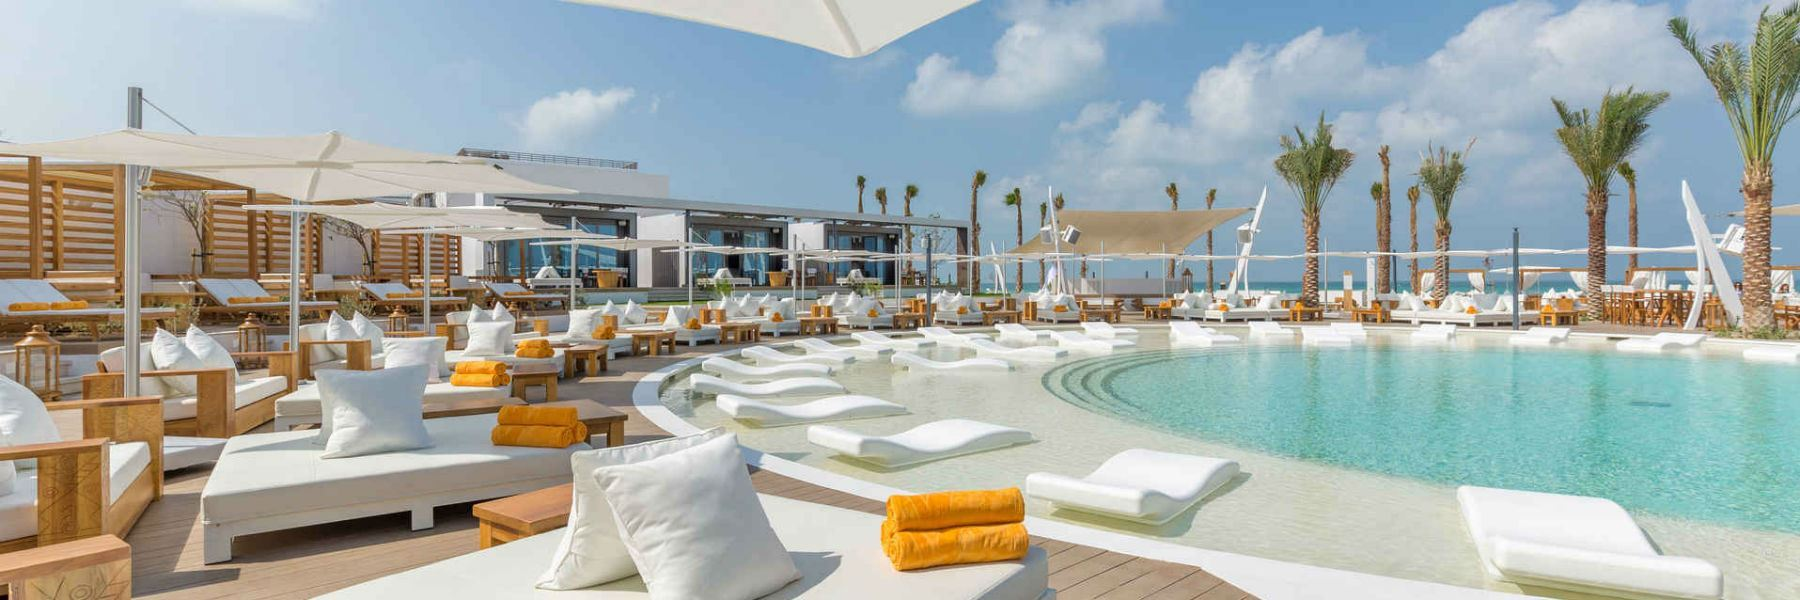 Nikki Beach Resort Spa Dubai Dubai And The Emirates Book Now